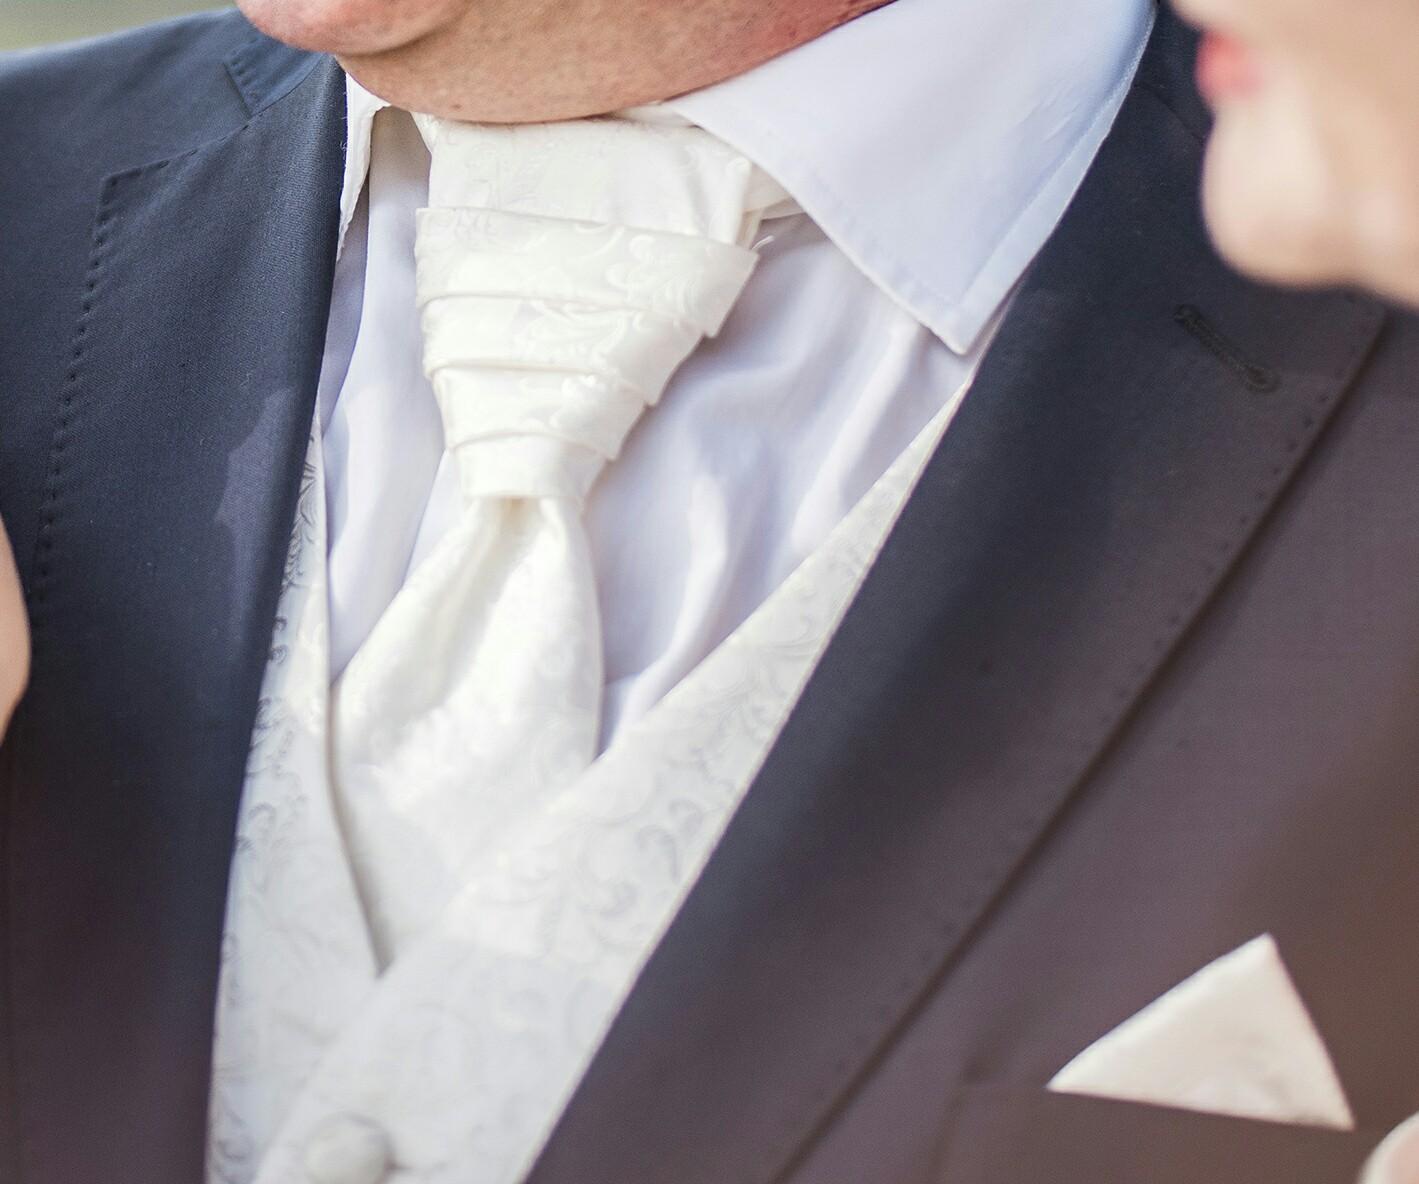 Svadobná vesta, kravata a vreckovka - Obrázok č. 1